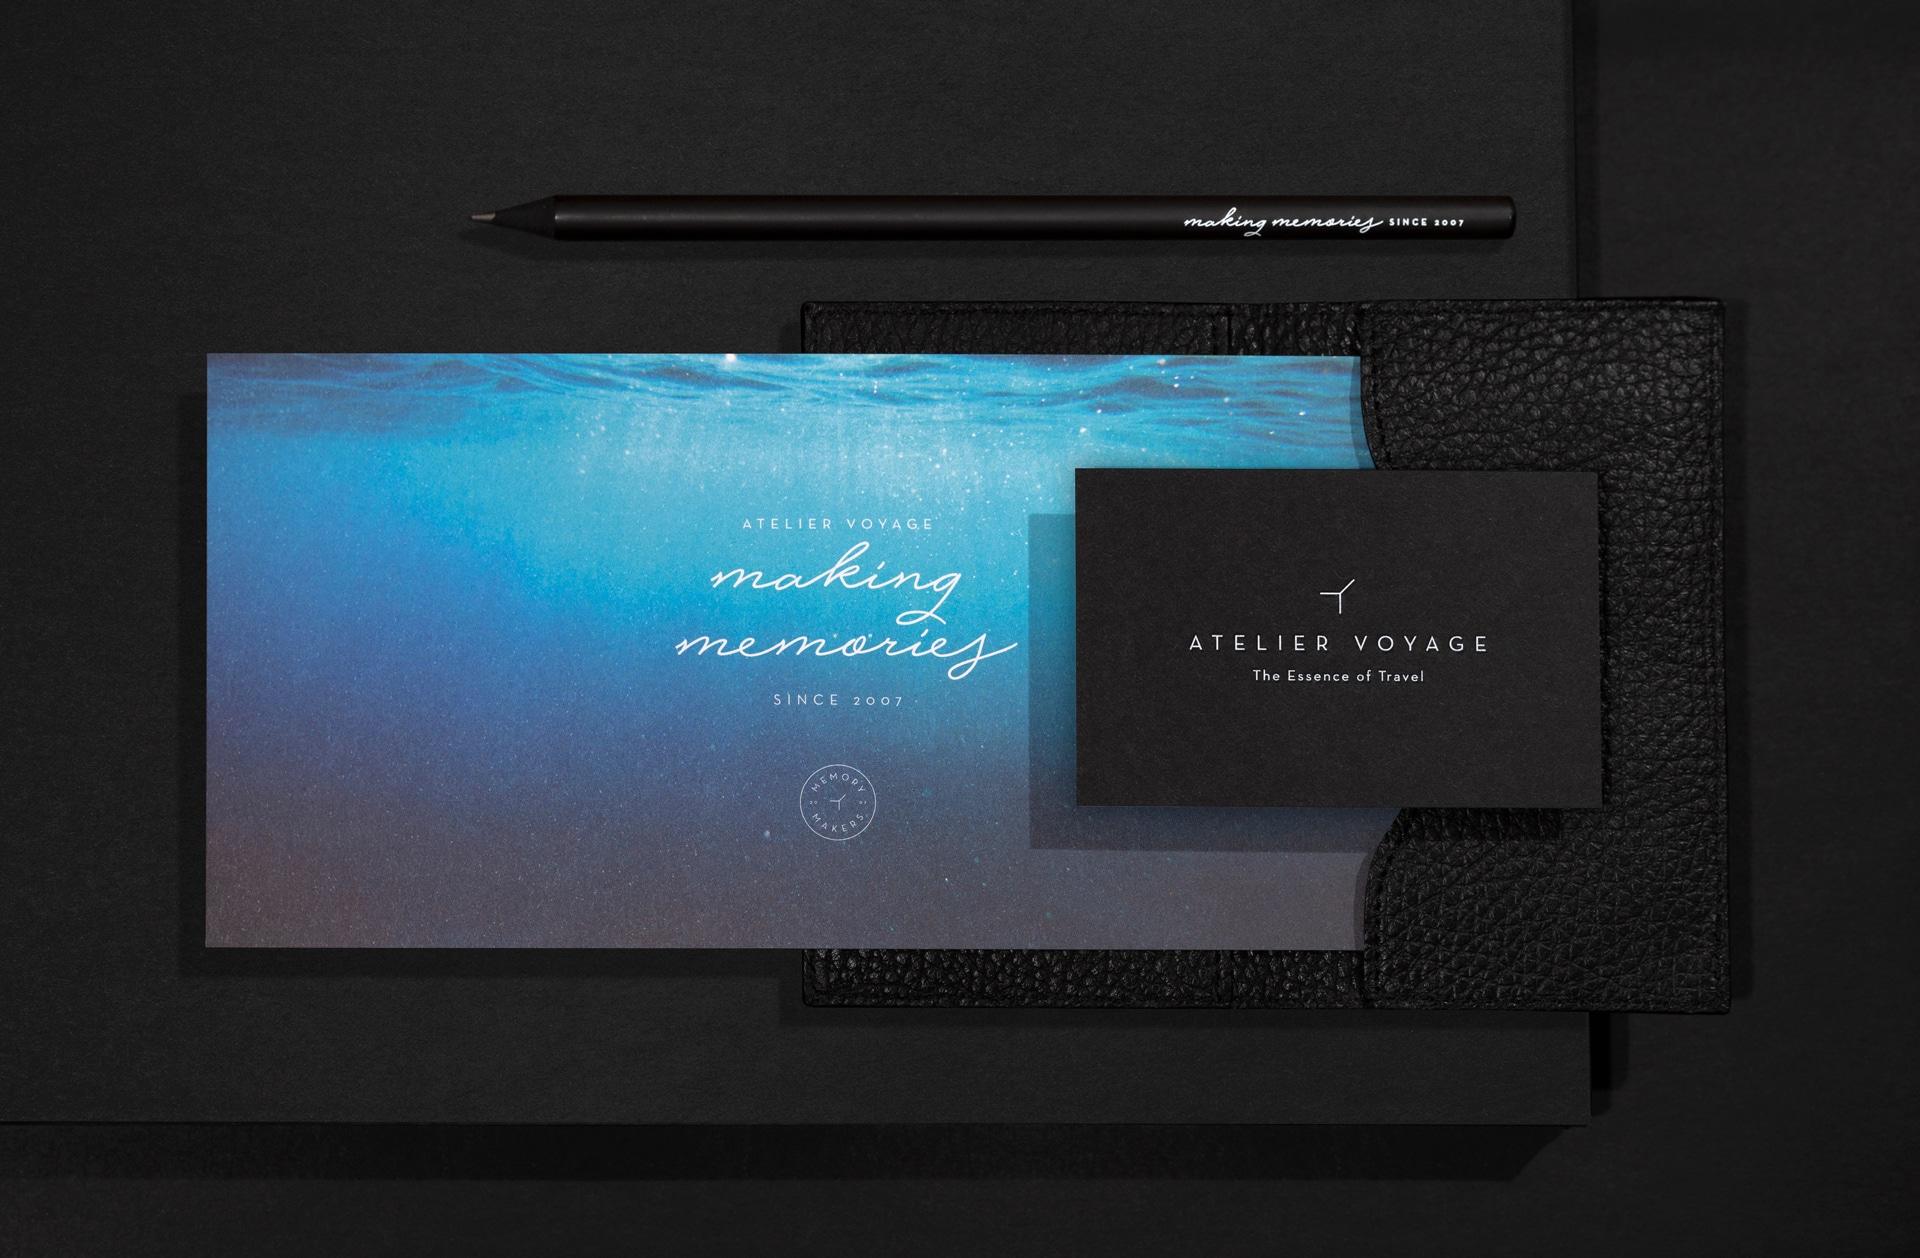 7_studiopona_ateliervoyage_branding_evolution.jpg